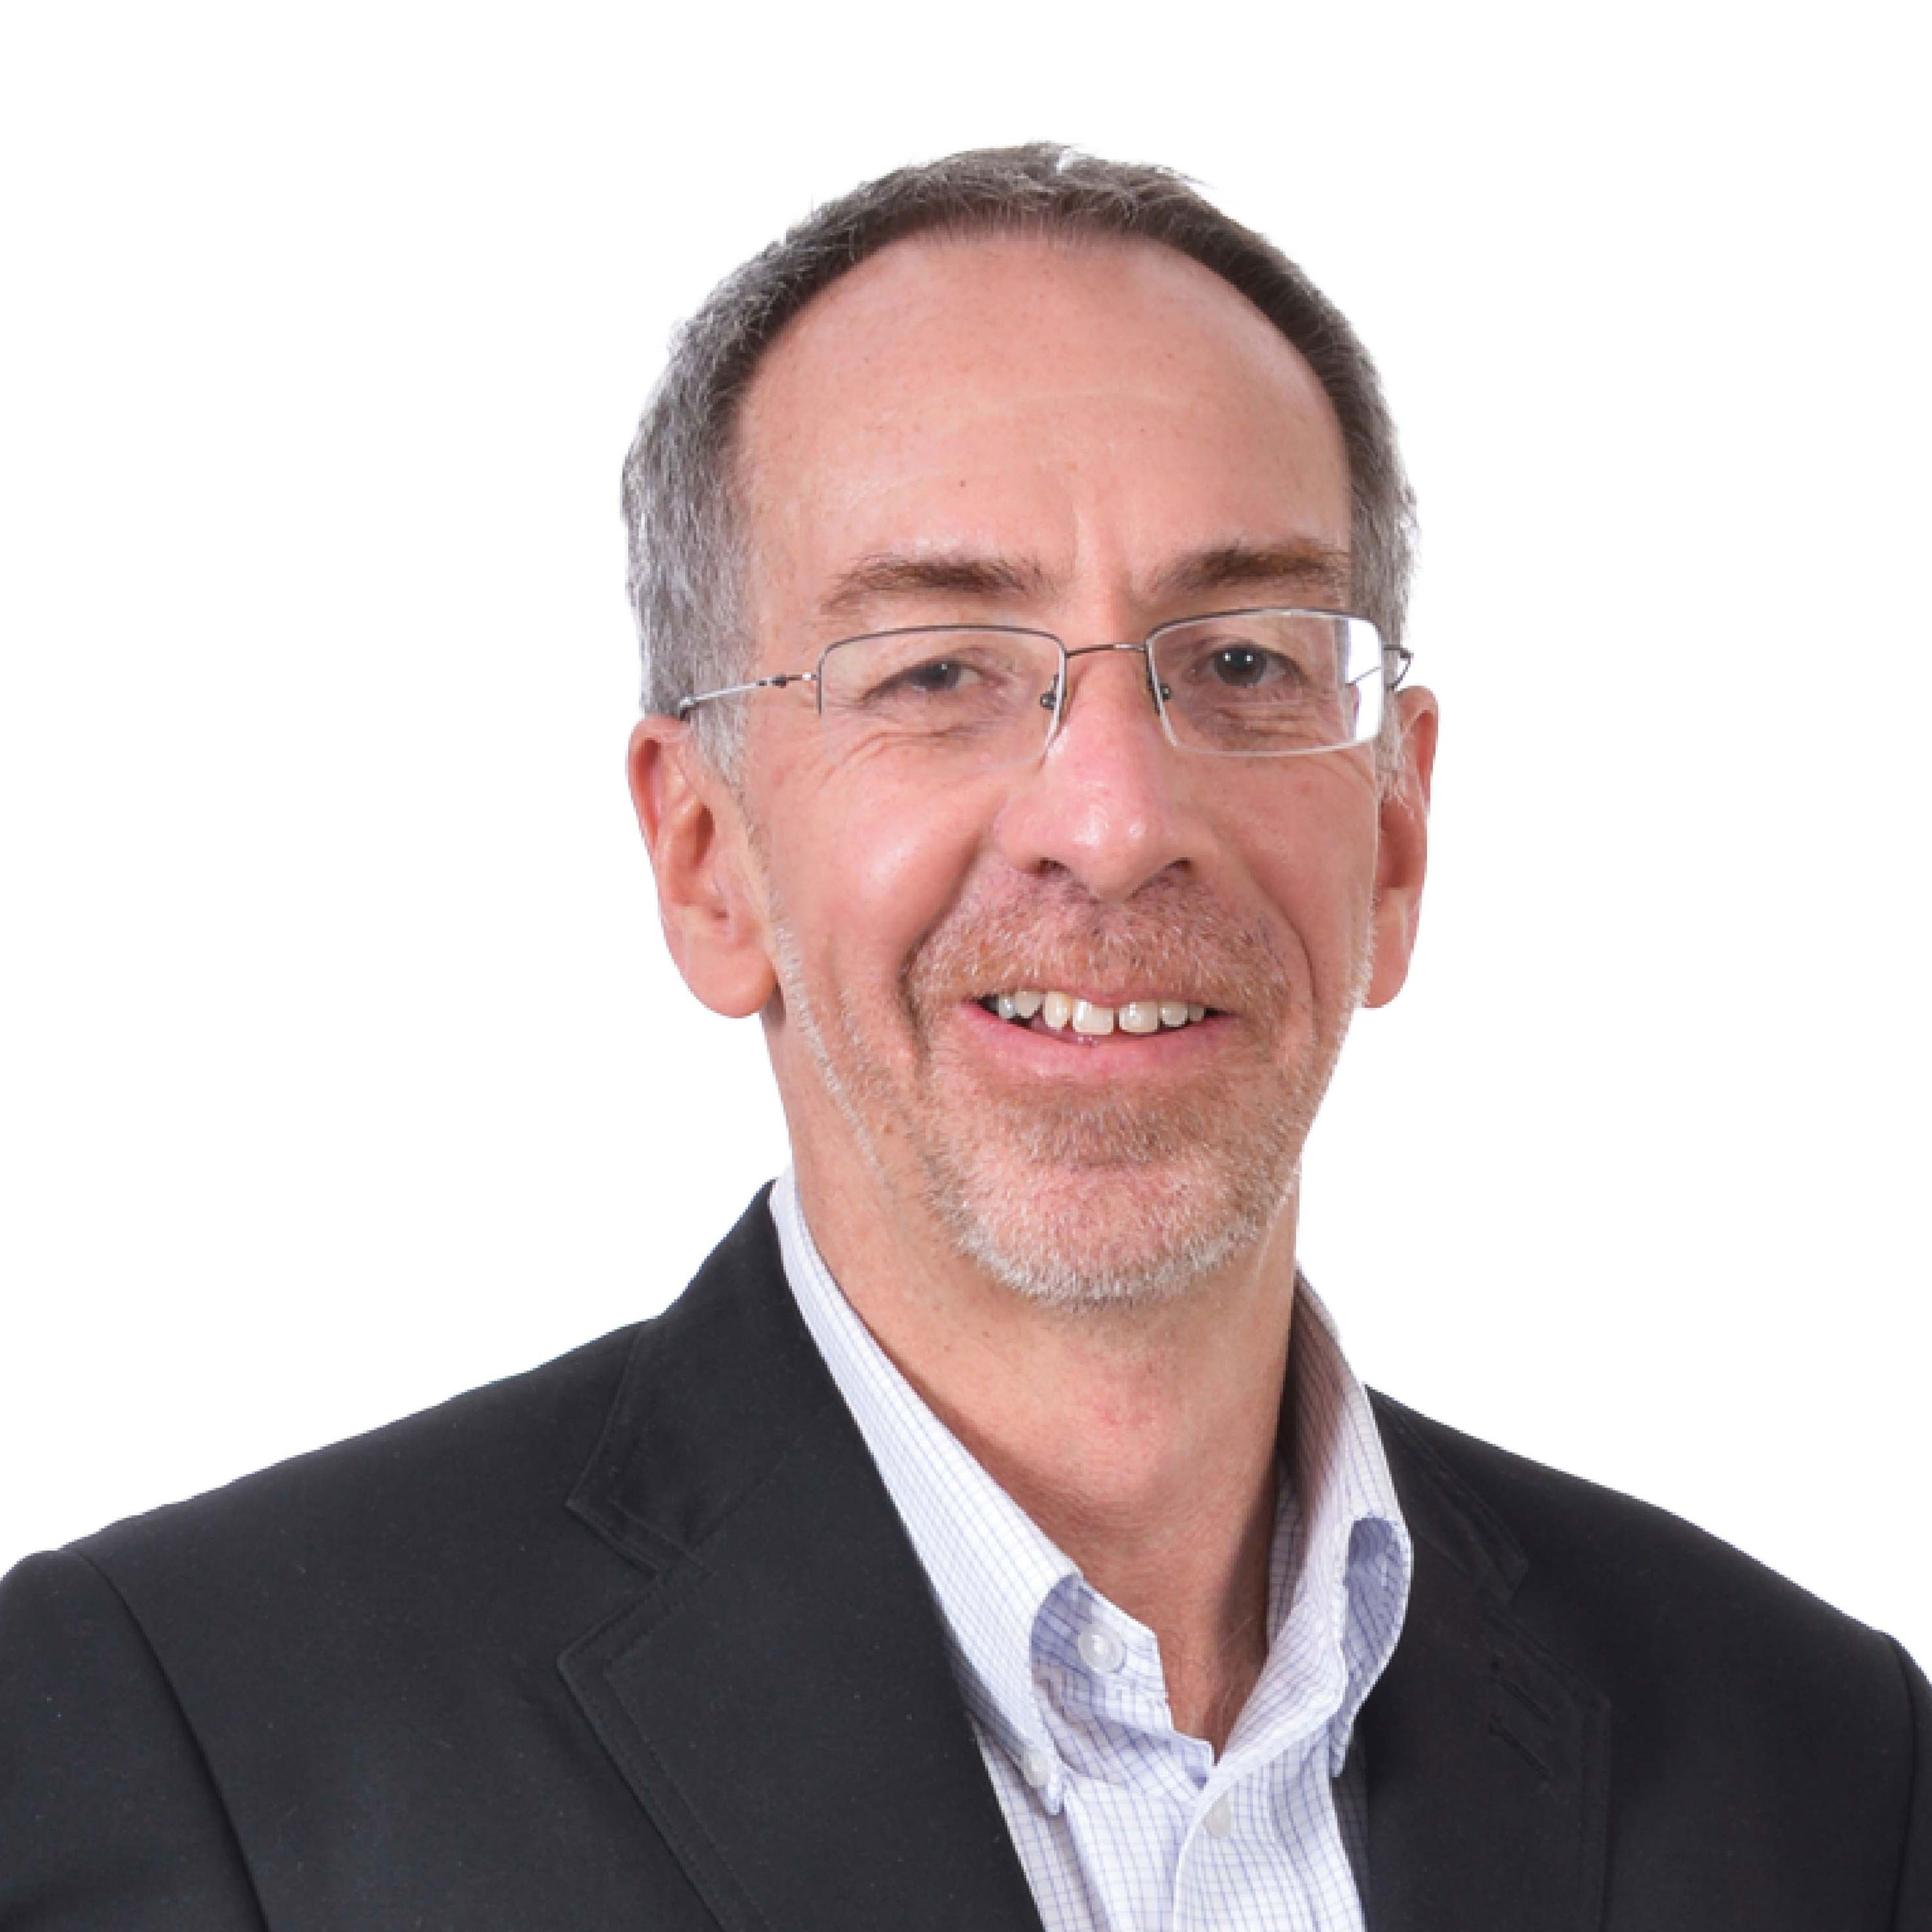 Profile photo of Daniel Dirk Ferreira, CFO at Astral Foods